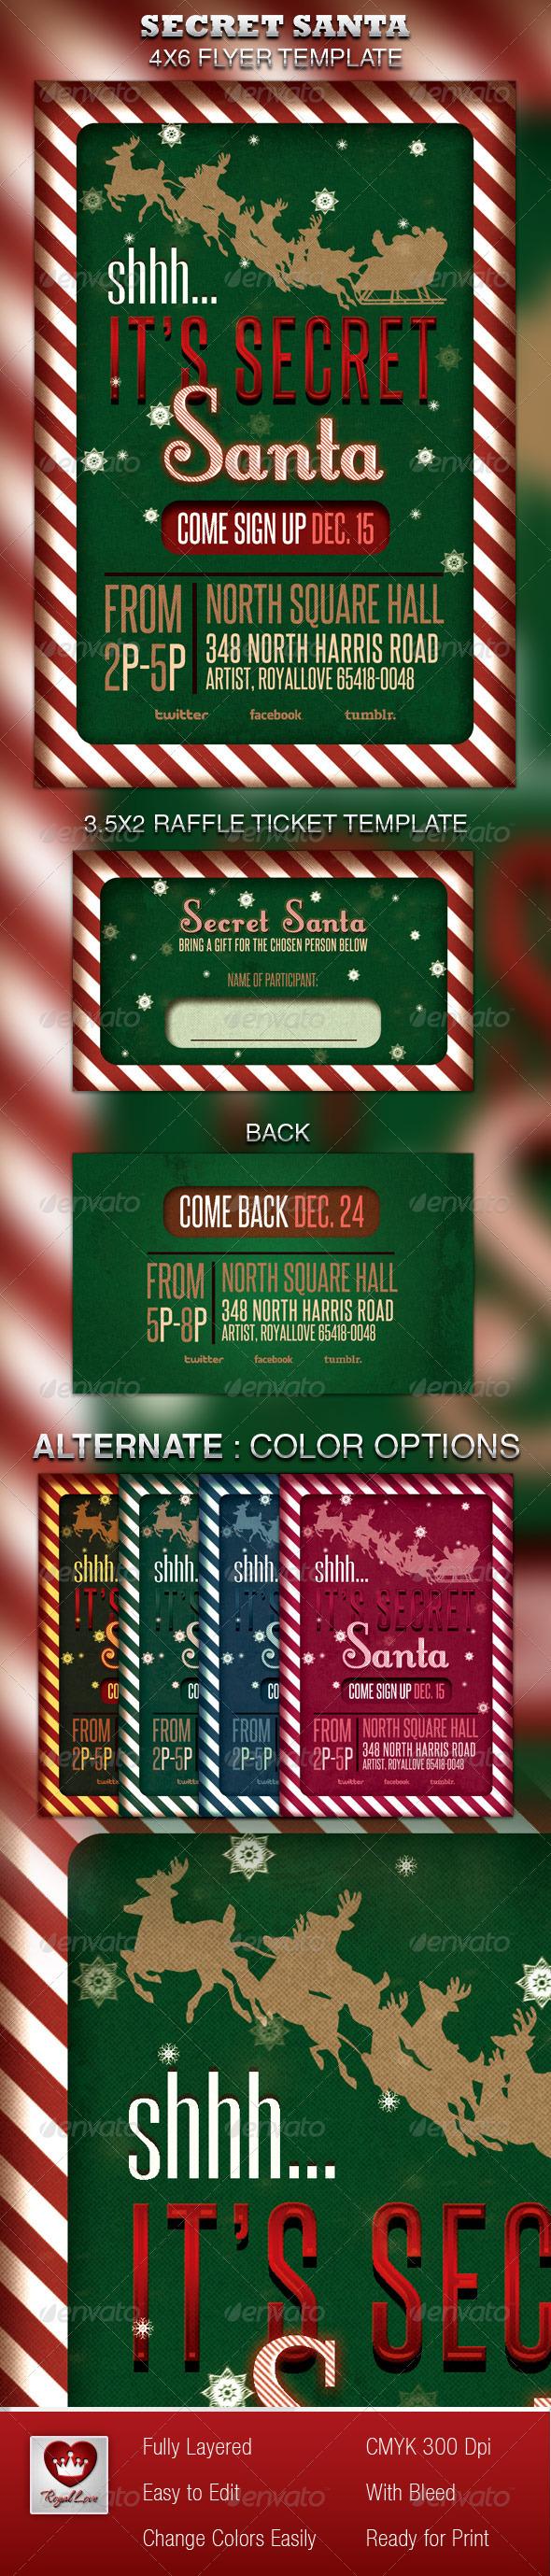 GraphicRiver Secret Santa Flyer & Raffle Ticket 3539458